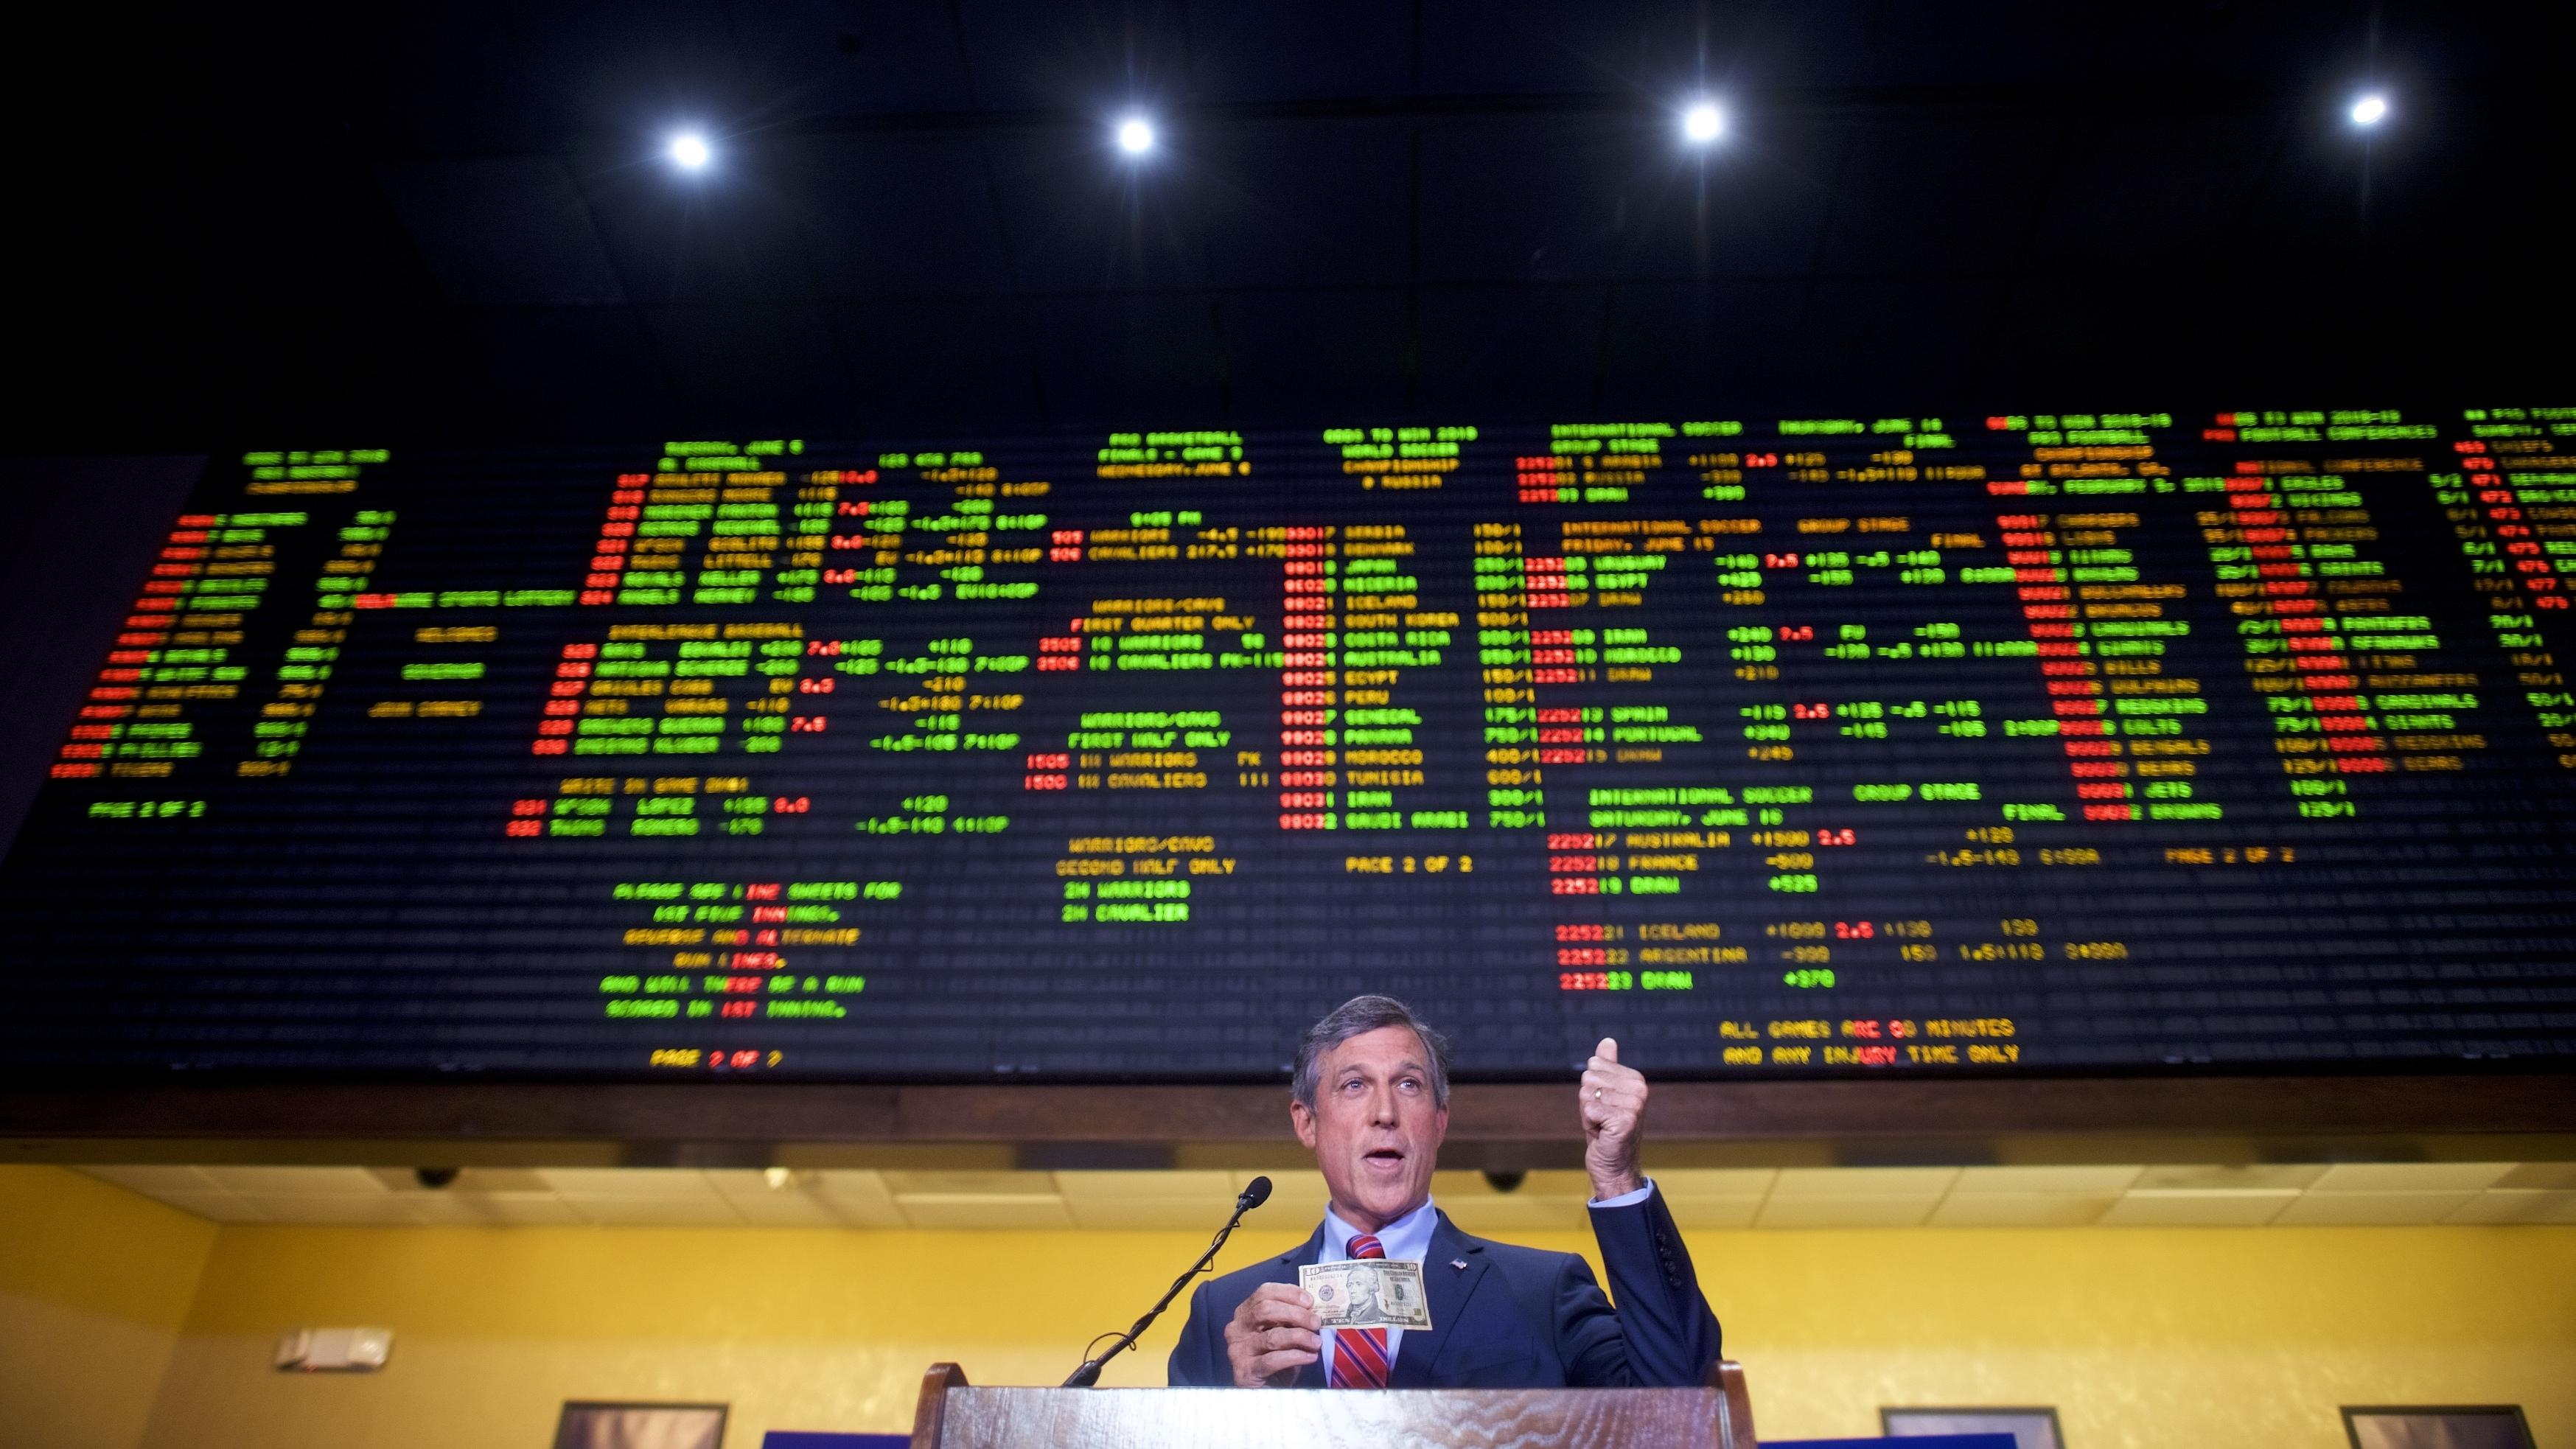 Cym delaware sports betting frases de joelmir bettingclosed